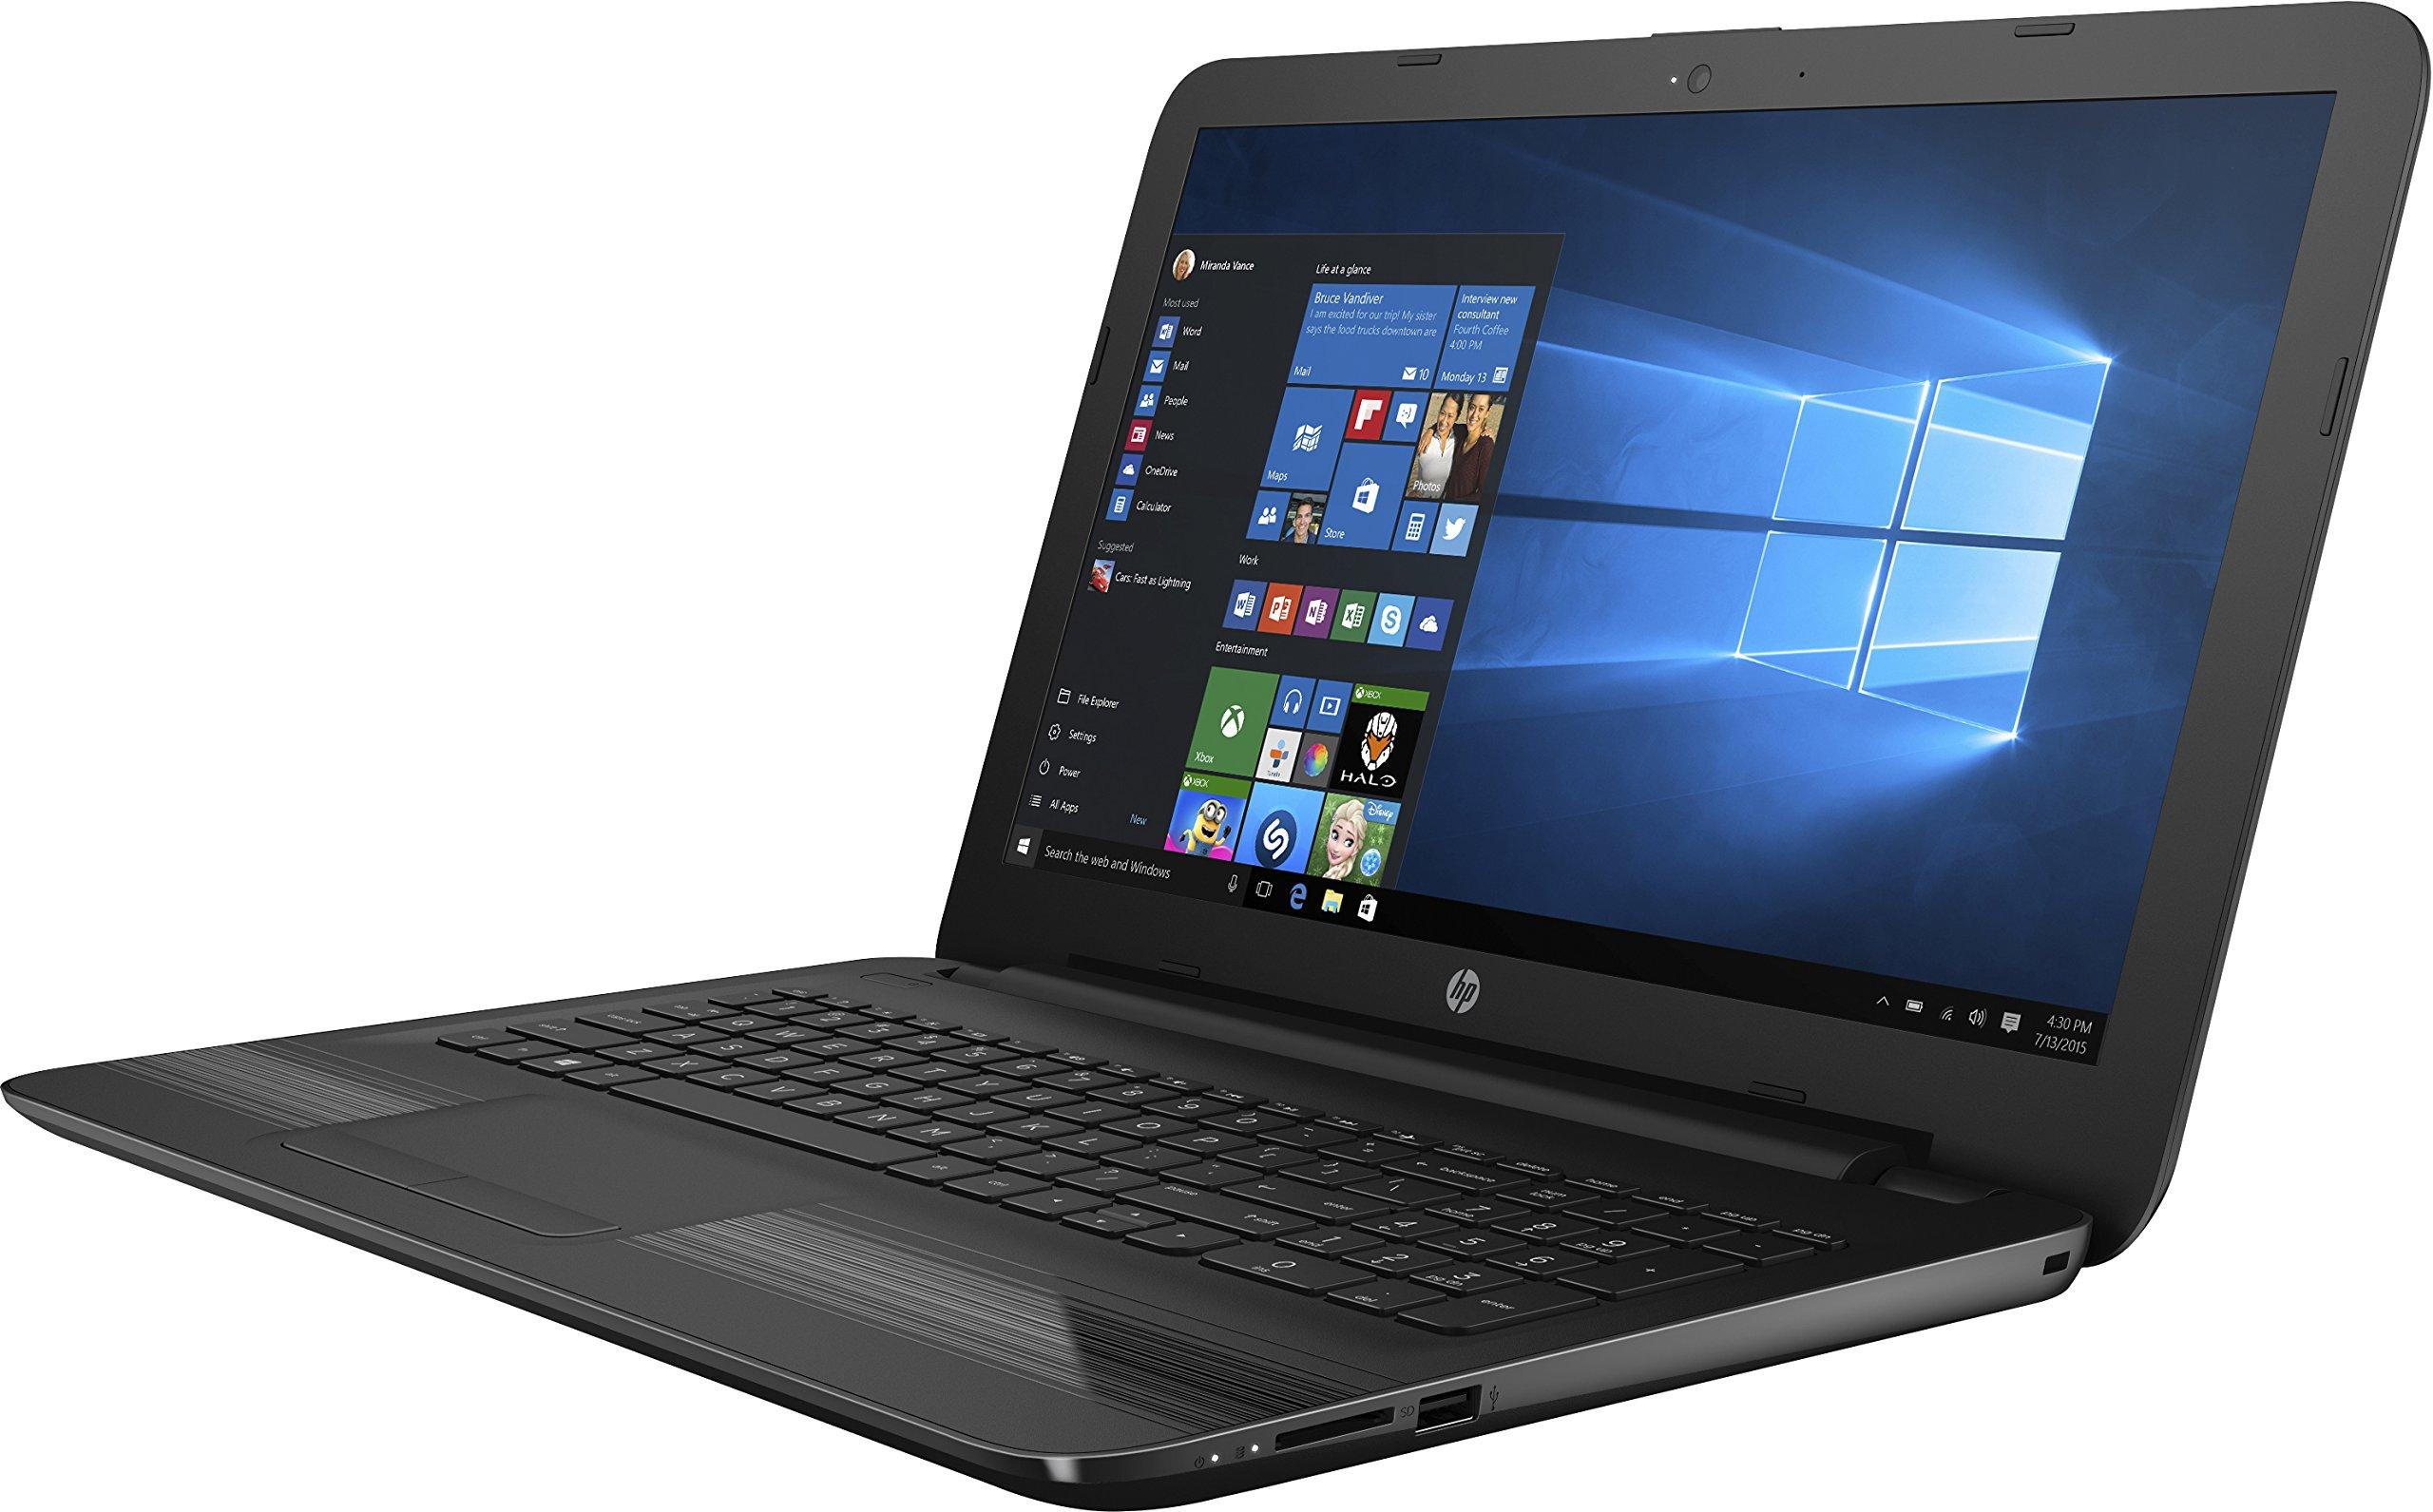 HP 15-BA000 15.6'' Laptop, HD Touchscreen, AMD A6-7310U 2GHz Quad-Core, 4GB DDR3, 2TB SATA, 802.11ac, Win10H - Jack Black (Certified Refurbished) by HP